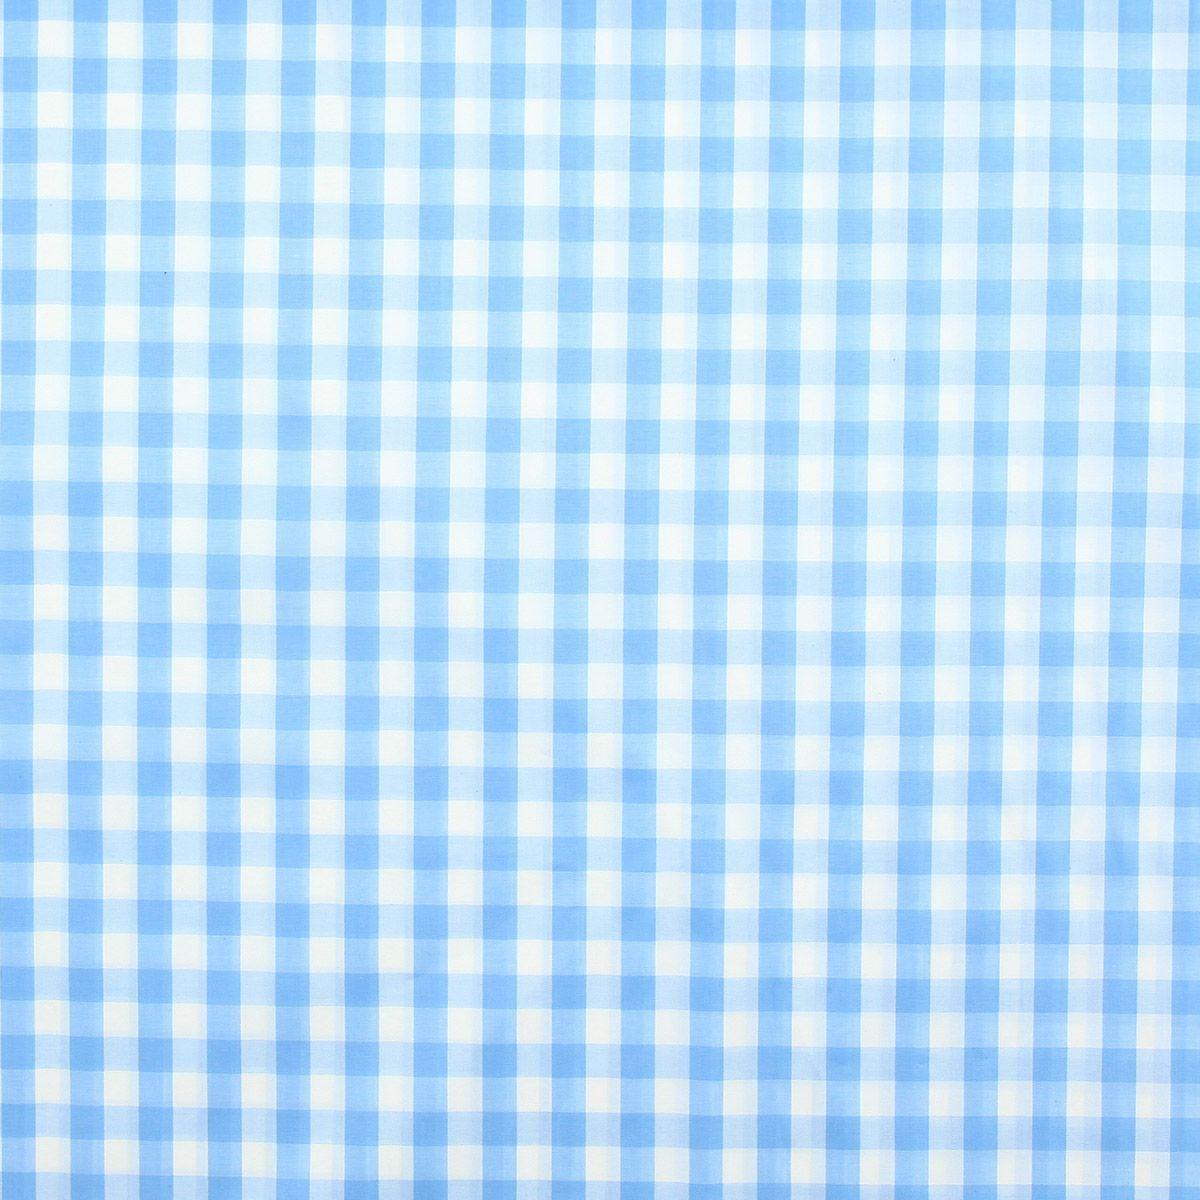 Tissu popeline de coton - Vichy grands carreaux - Bleu ciel